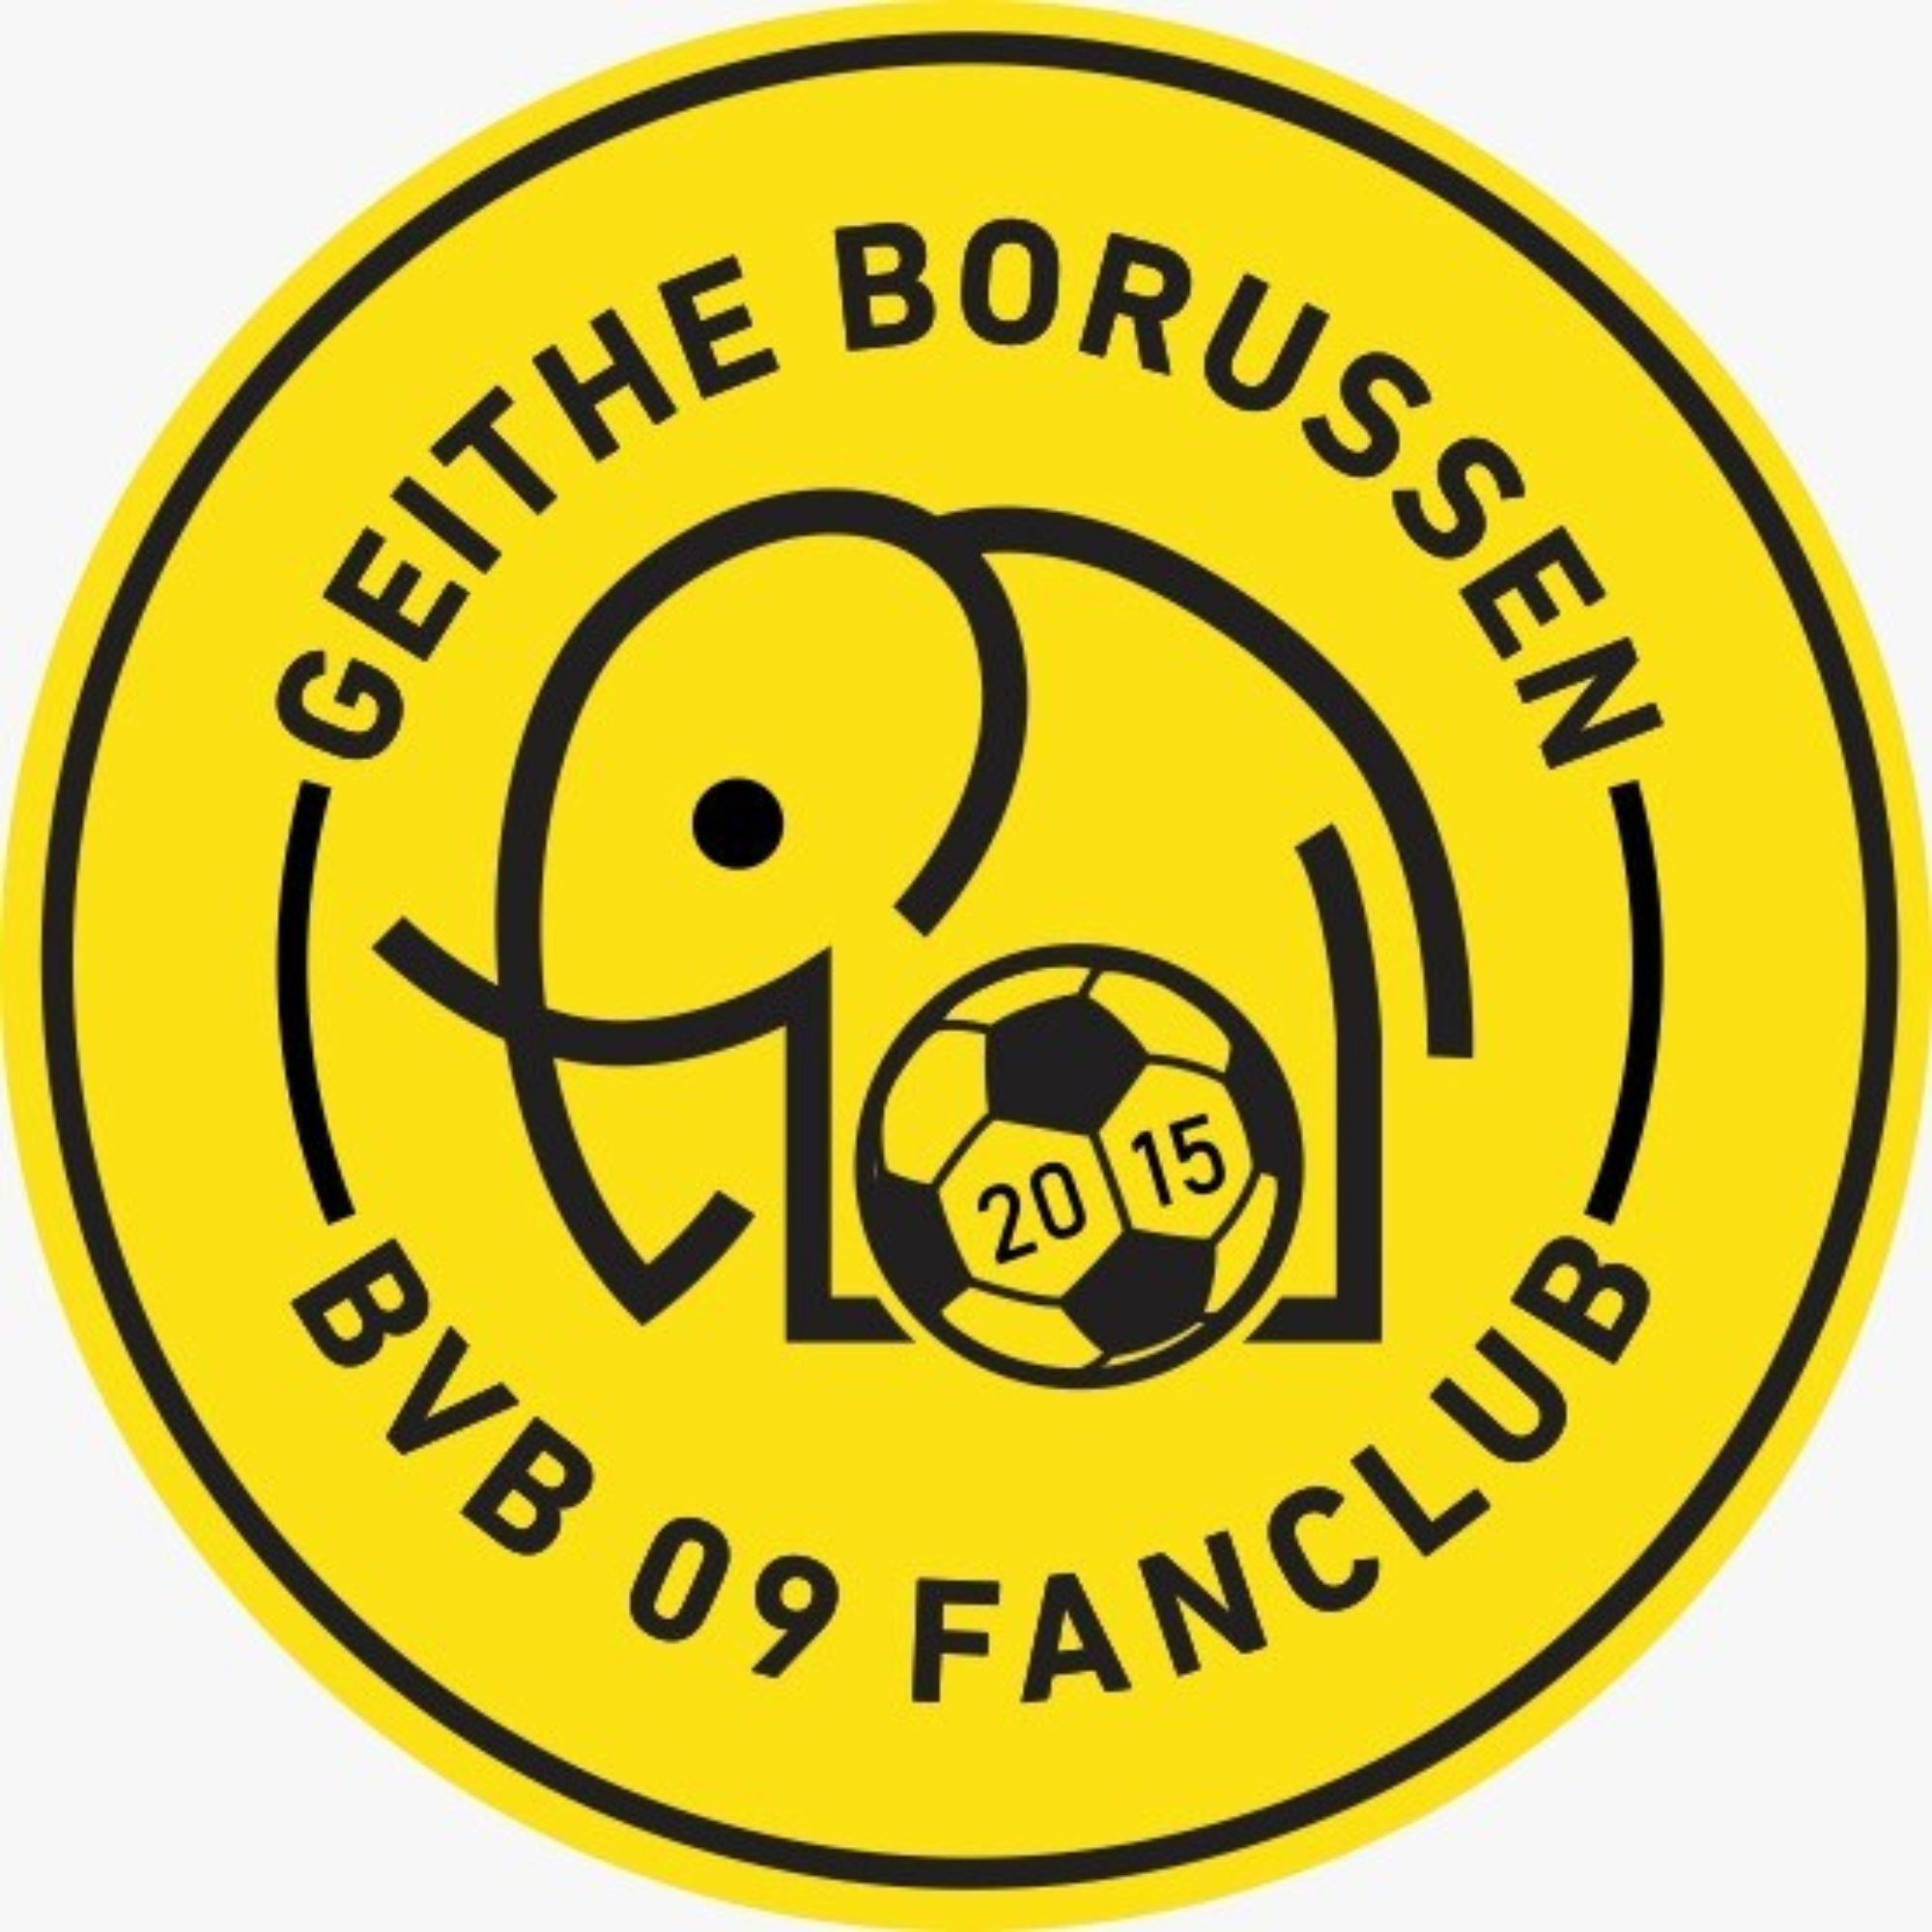 BVB Fanclub GEITHE BORUSSEN